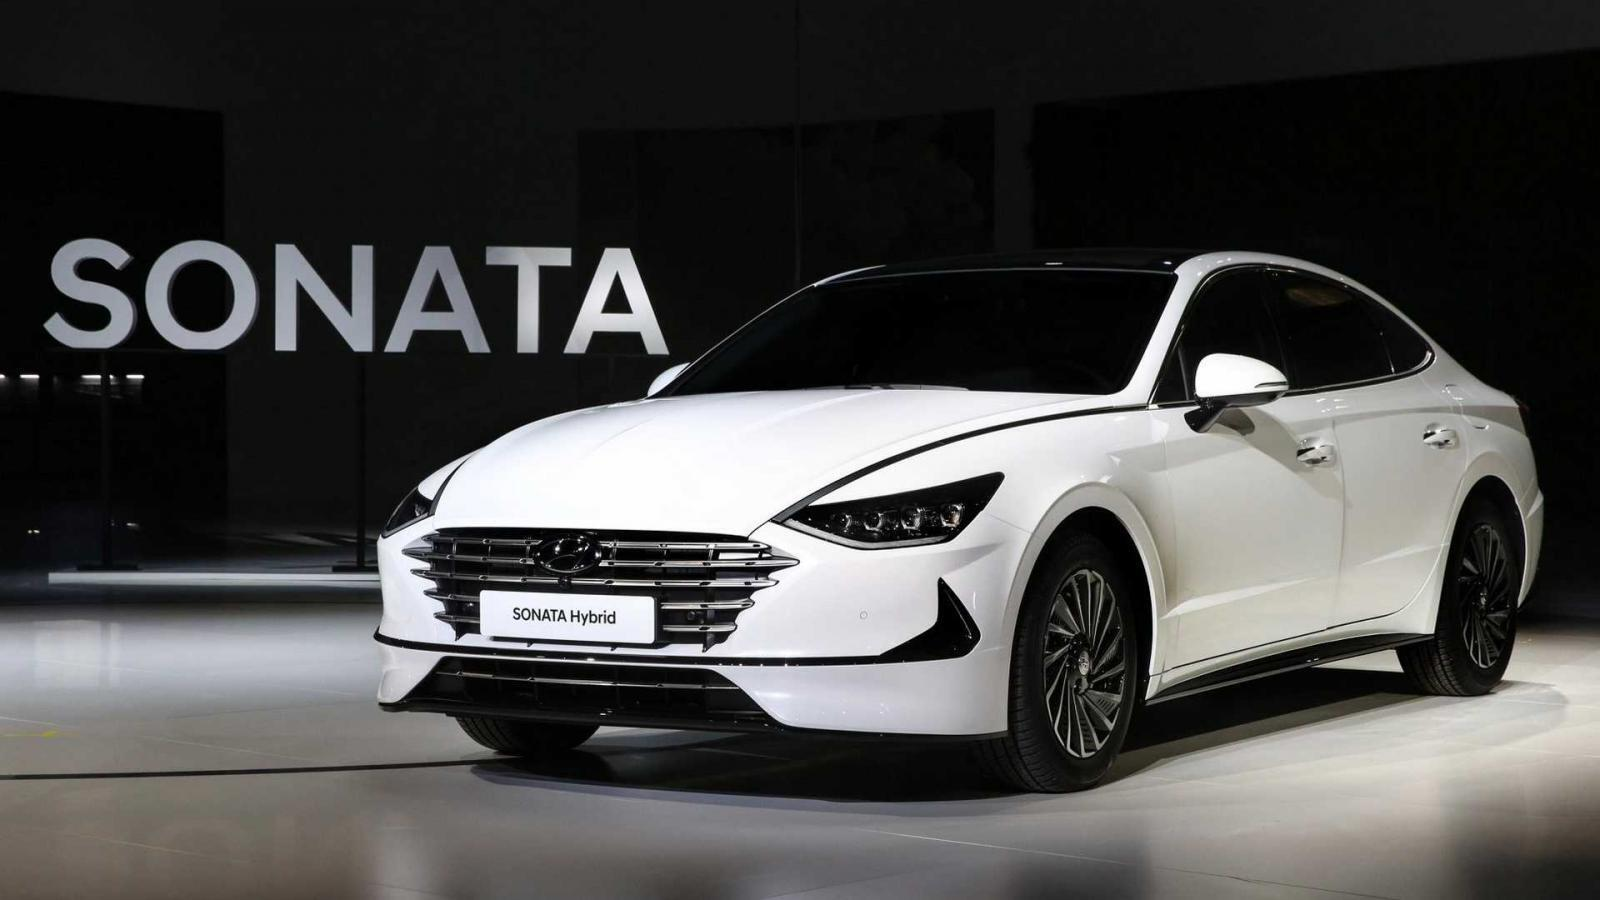 ven-man-hyundai-sonata-16-turbo-2020-voi-dong-co-manh-me-va-thiet-ke-the-thao-6.jpg